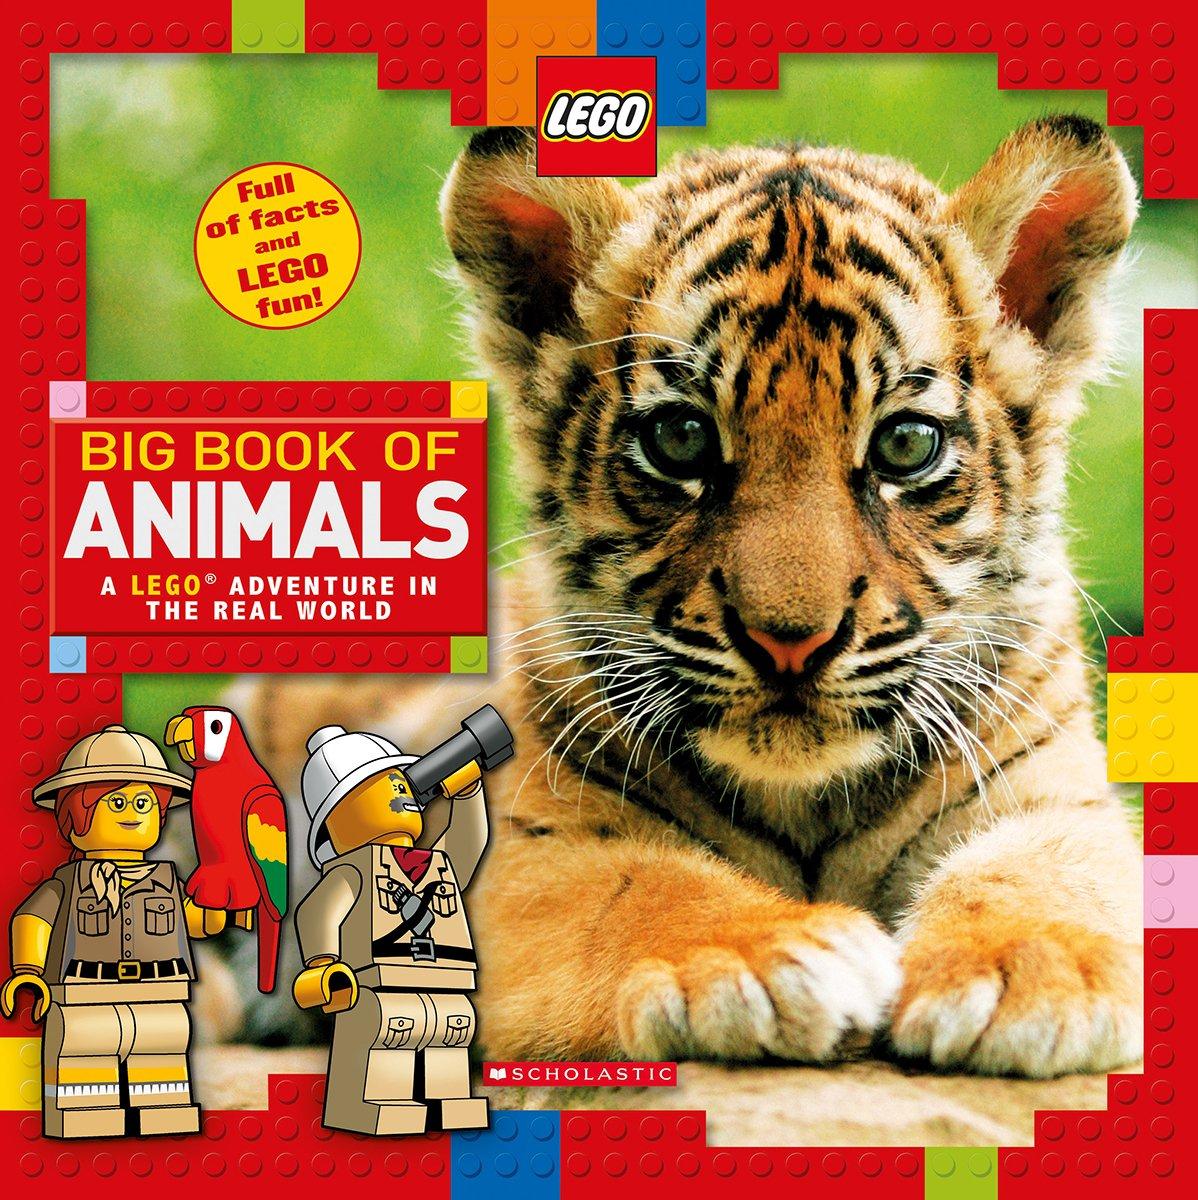 Big Book of Animals (LEGO Nonfiction) ebook